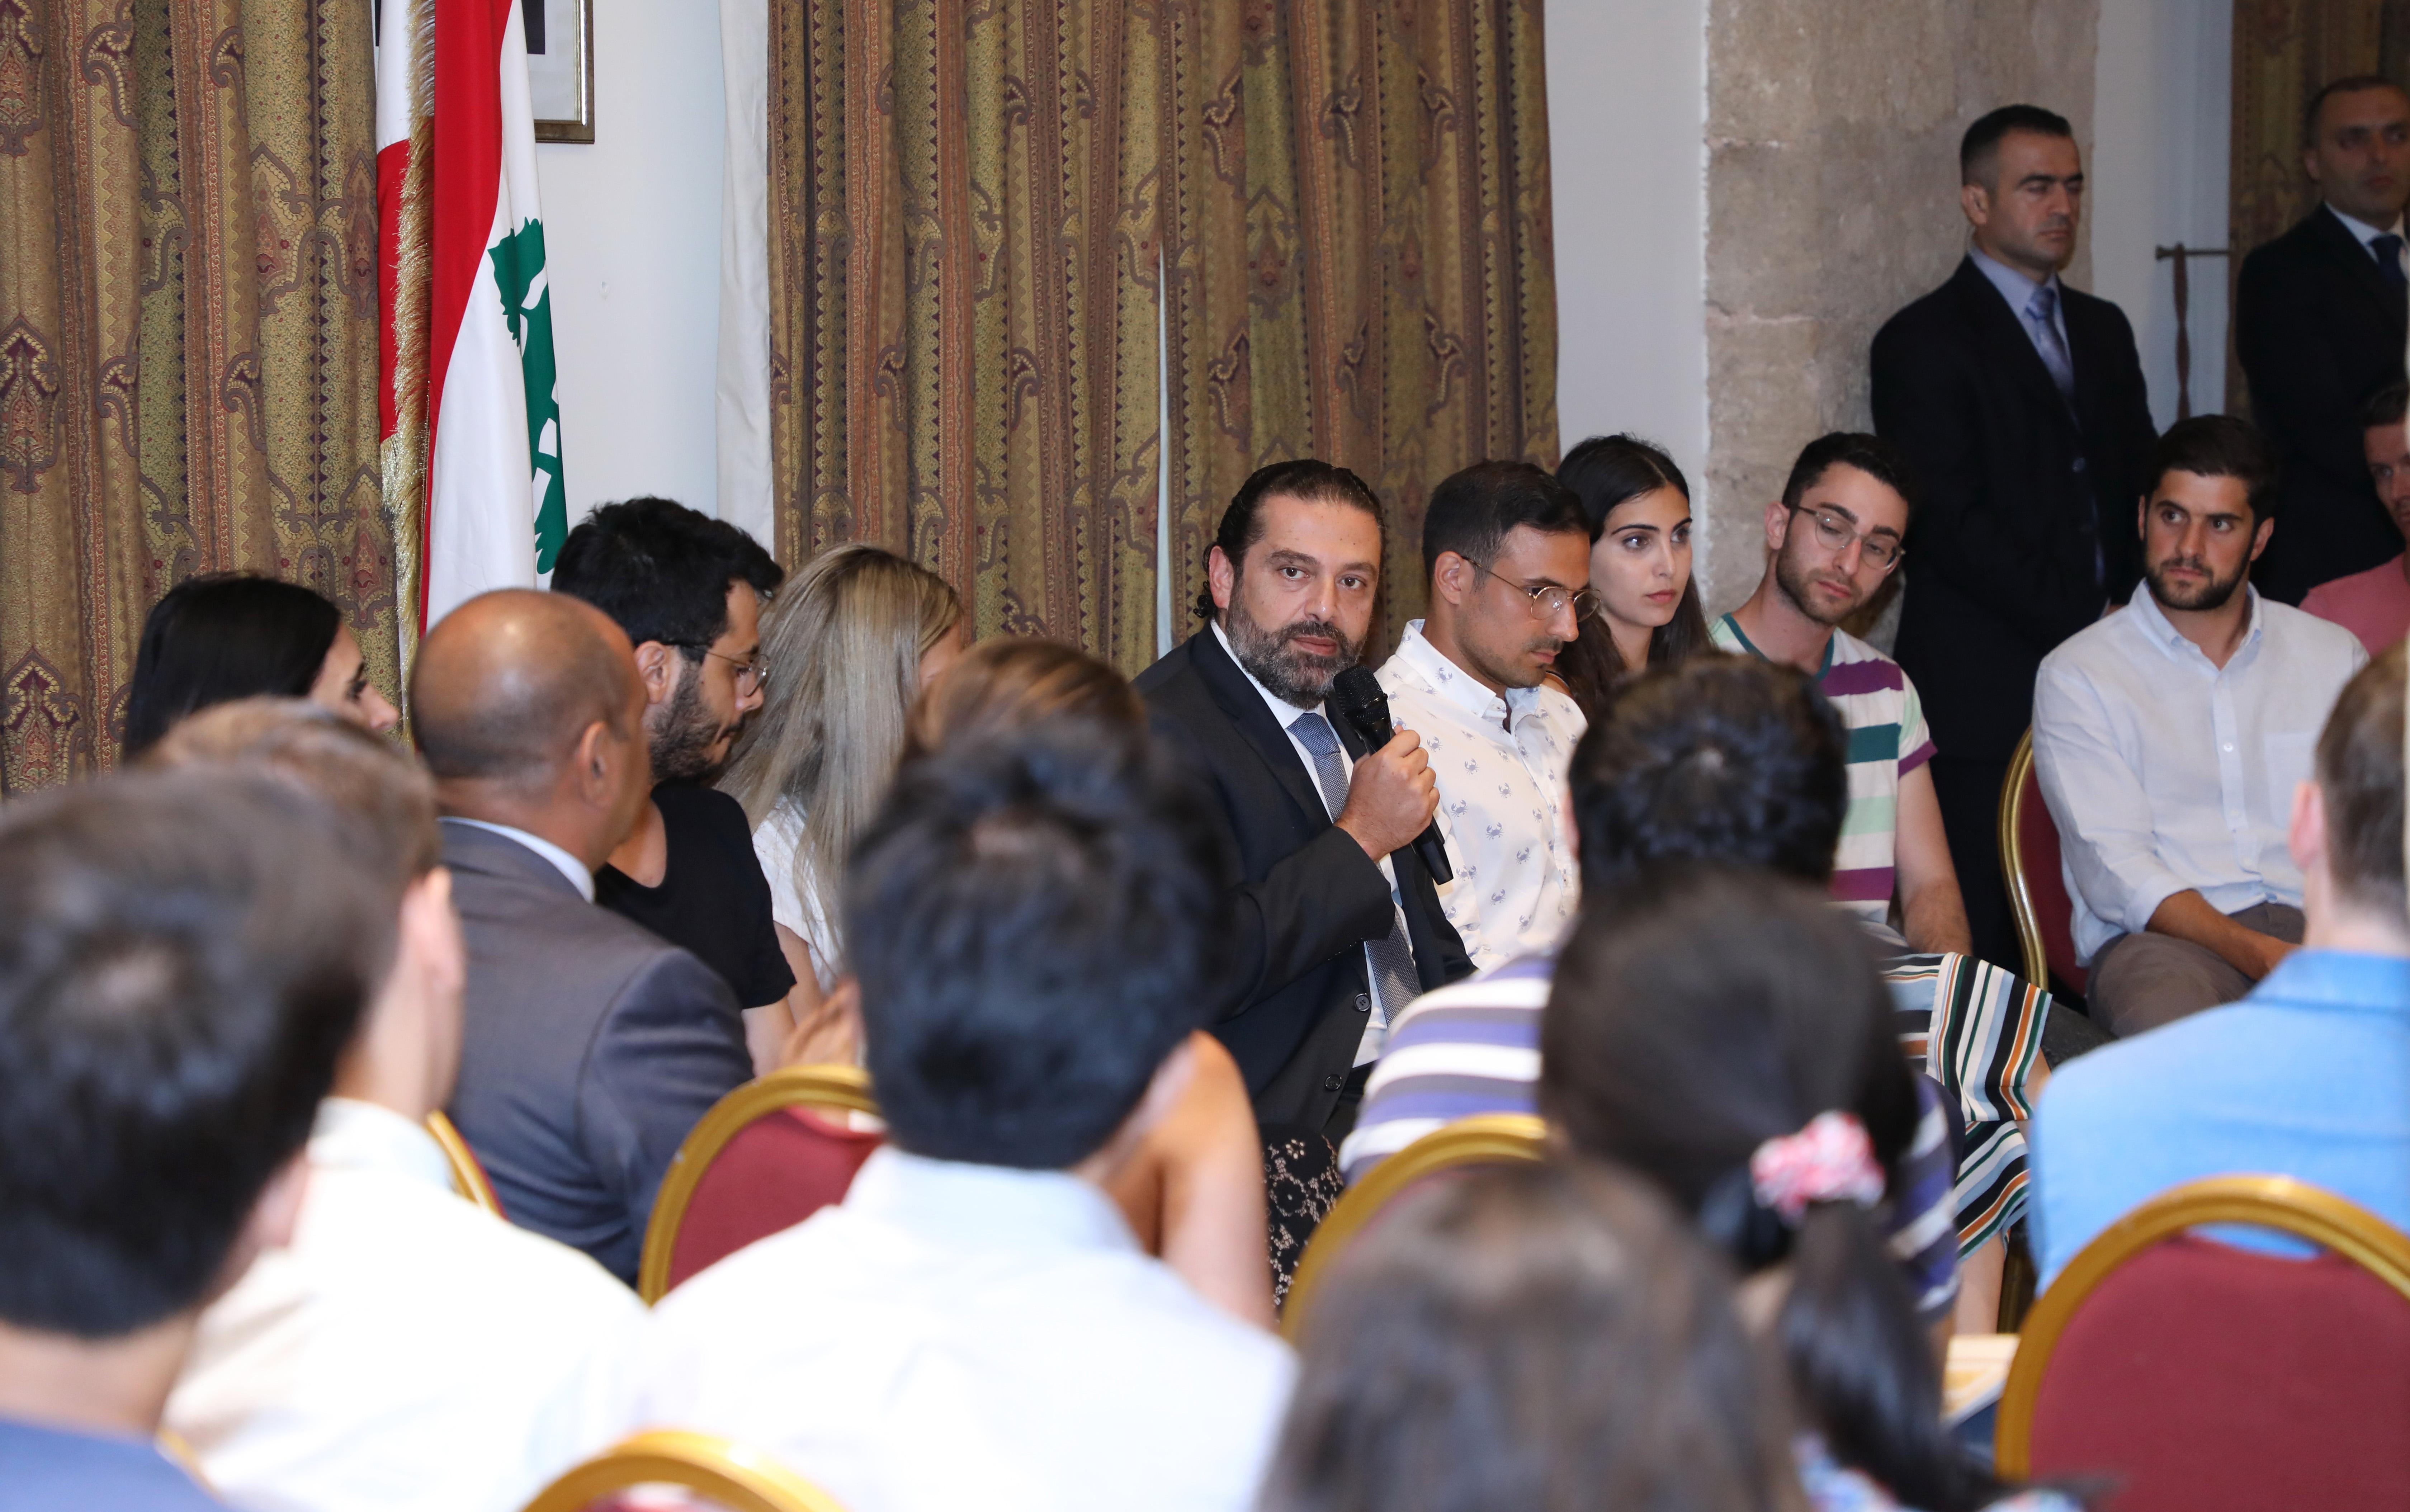 Pr Minister Saad Hariri meets a Delegation from Harvard Students